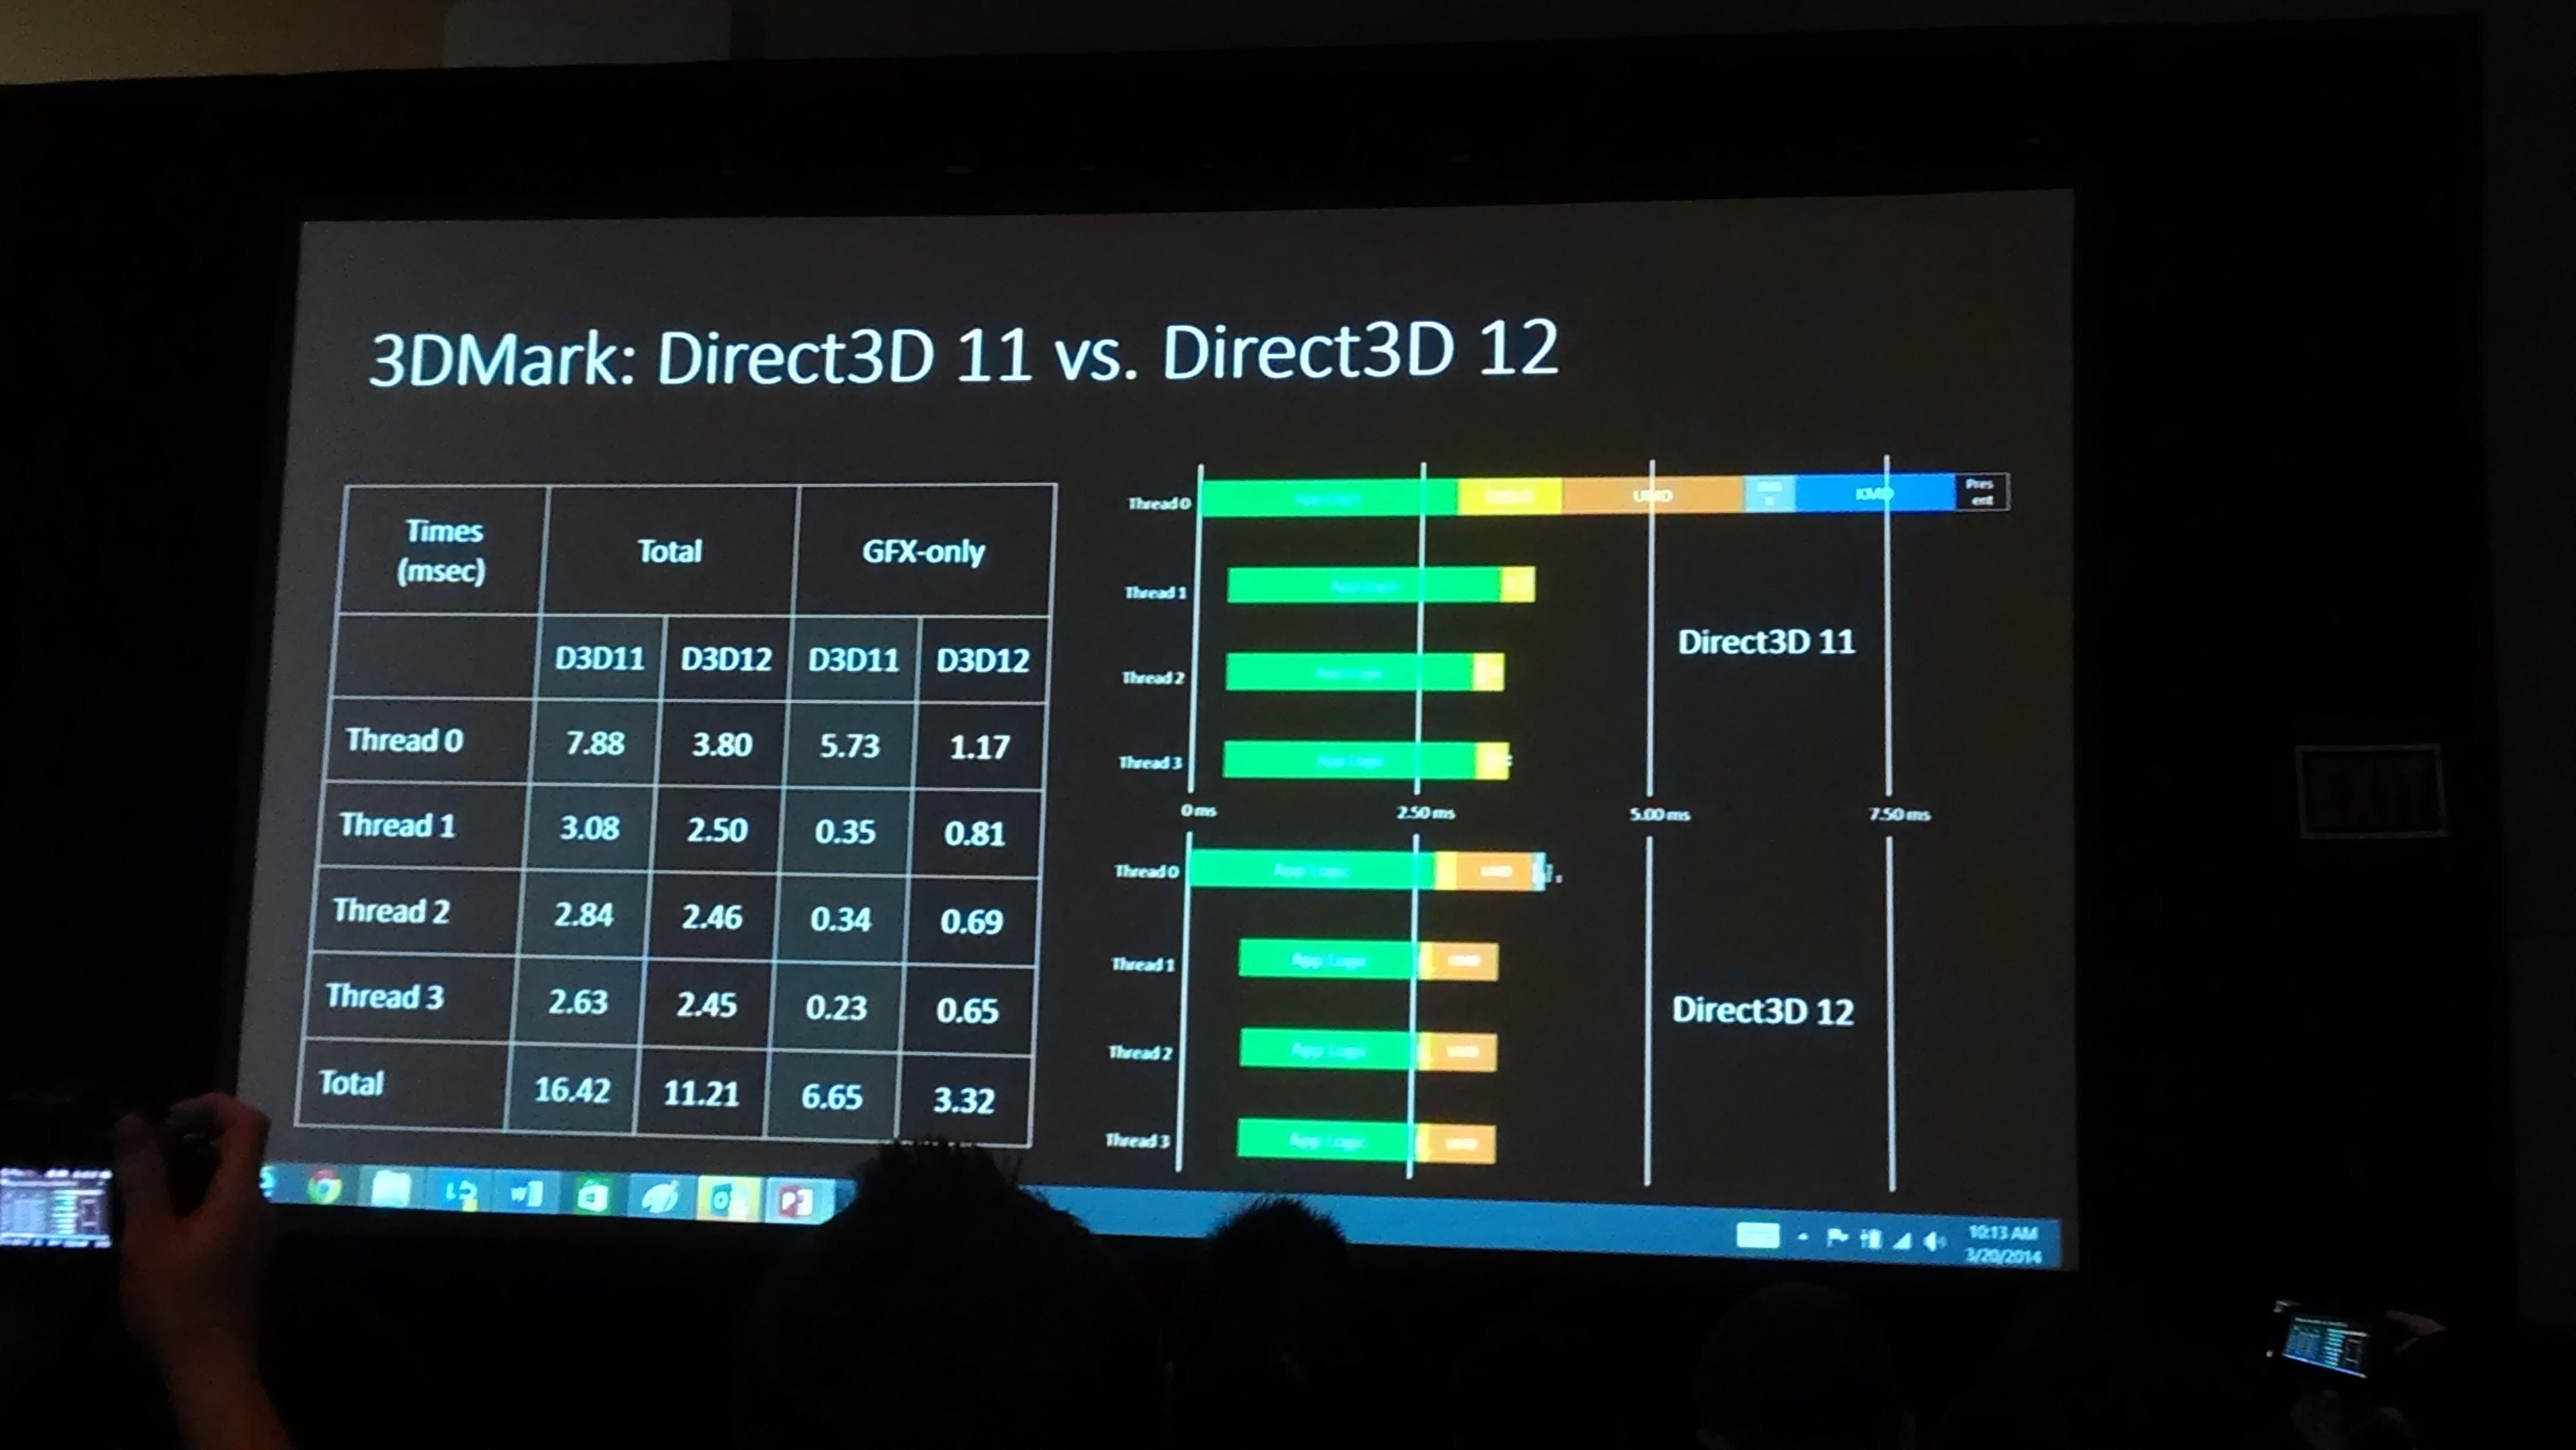 Direct3D 12